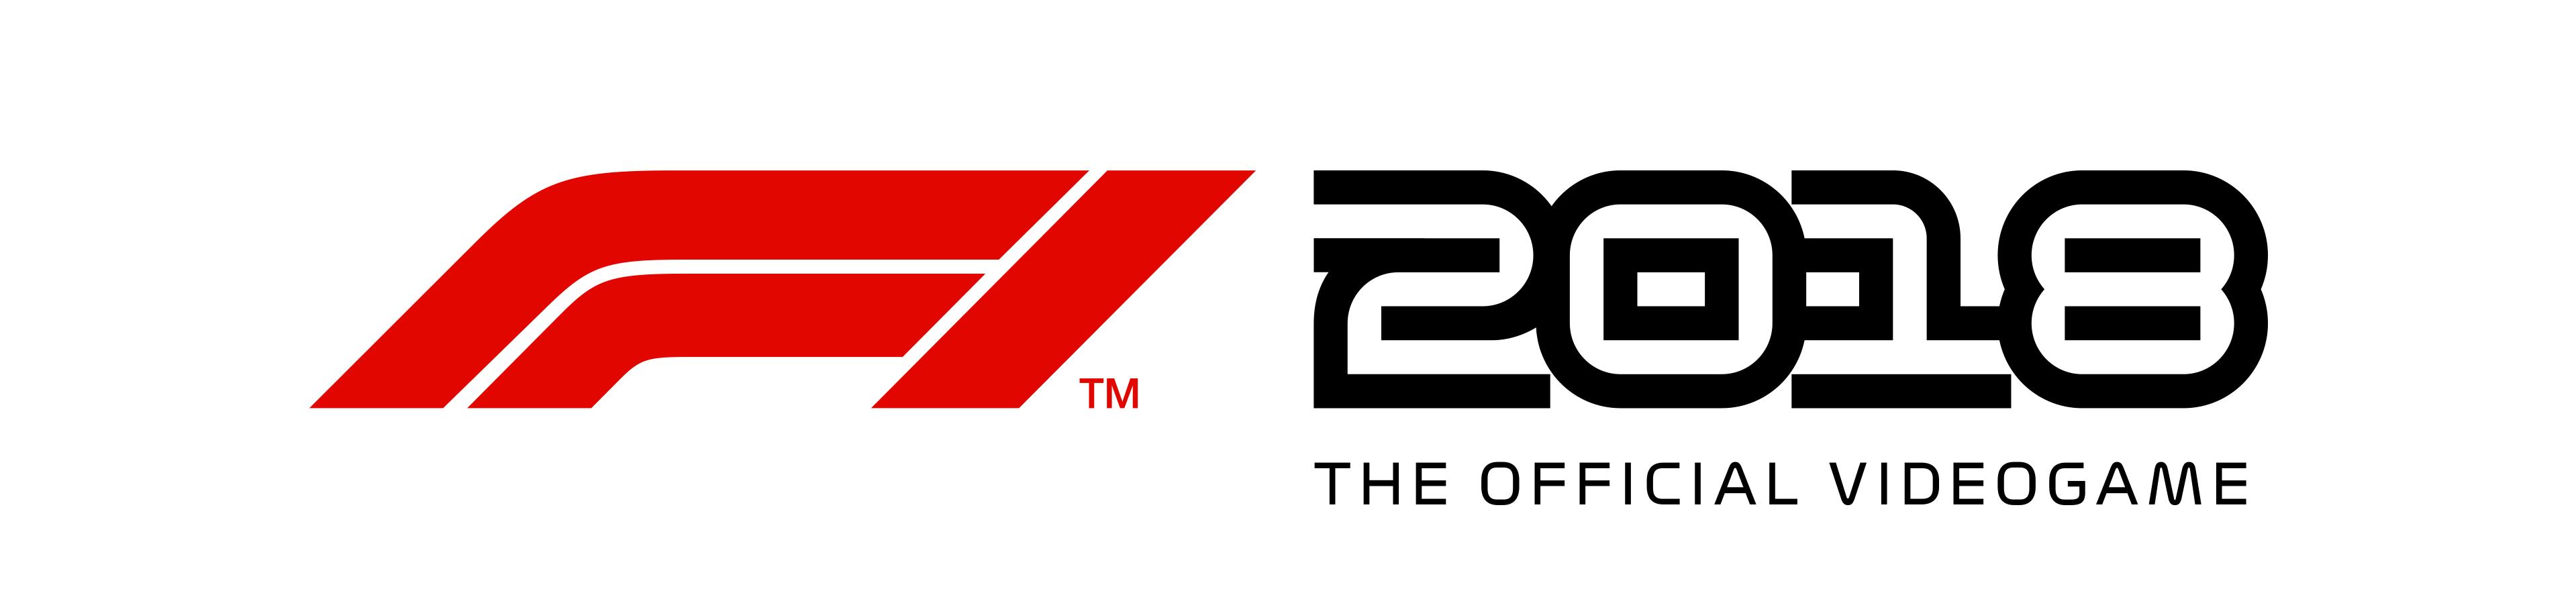 f12018-logotag-hz_colfypzg.png